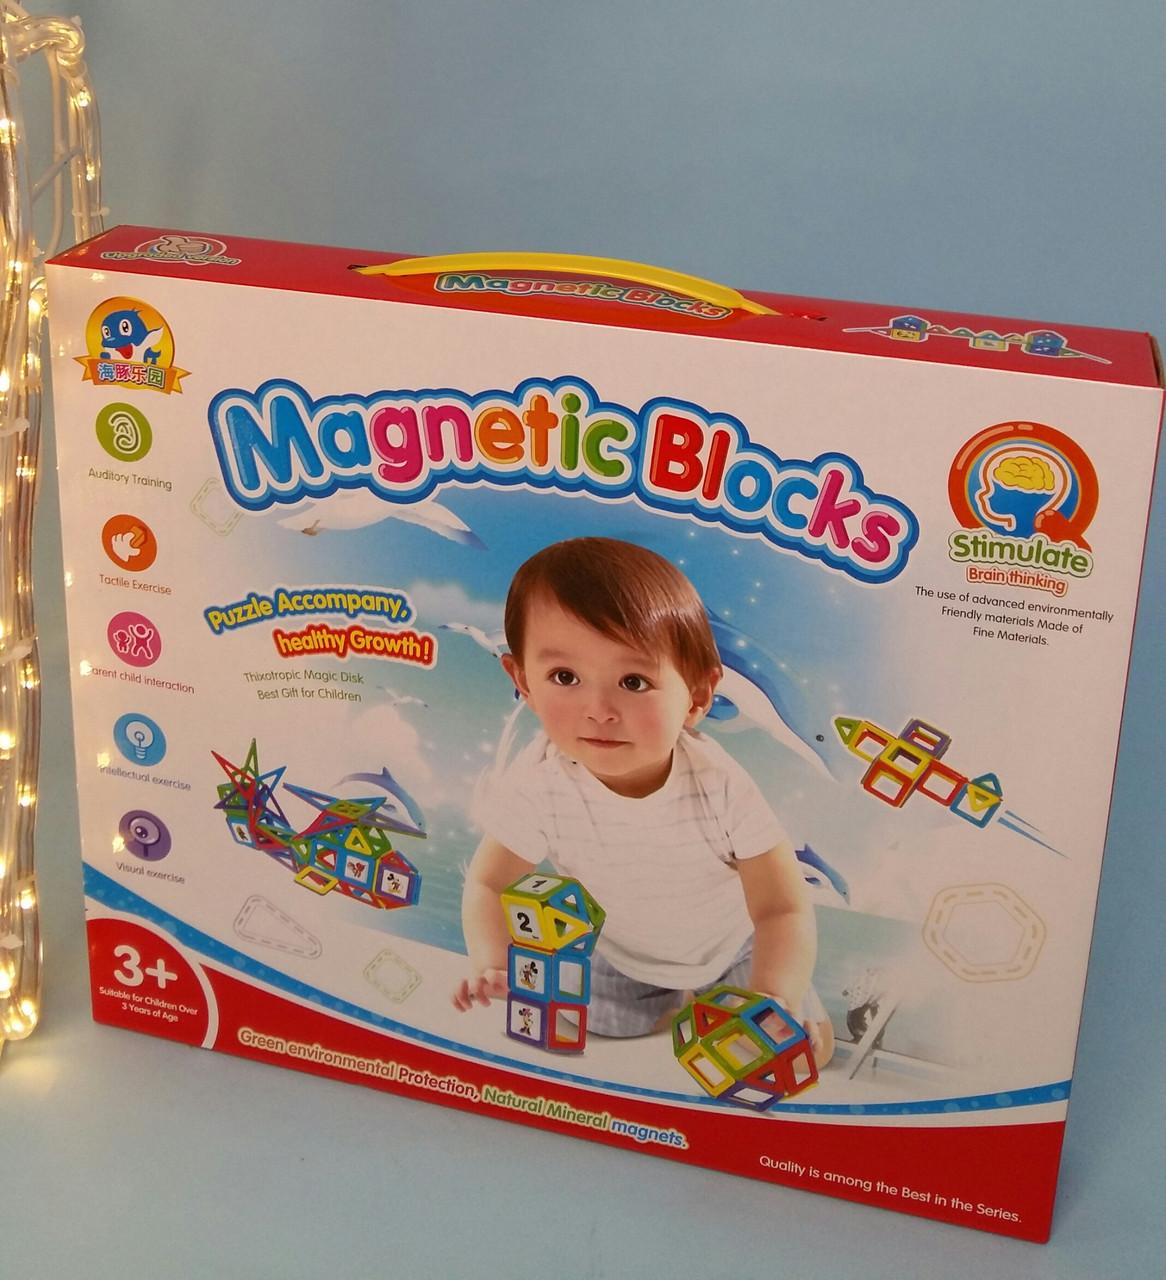 Магнітний конструктор Magnetic Blocks, 22 деталі, 2266-1-3366